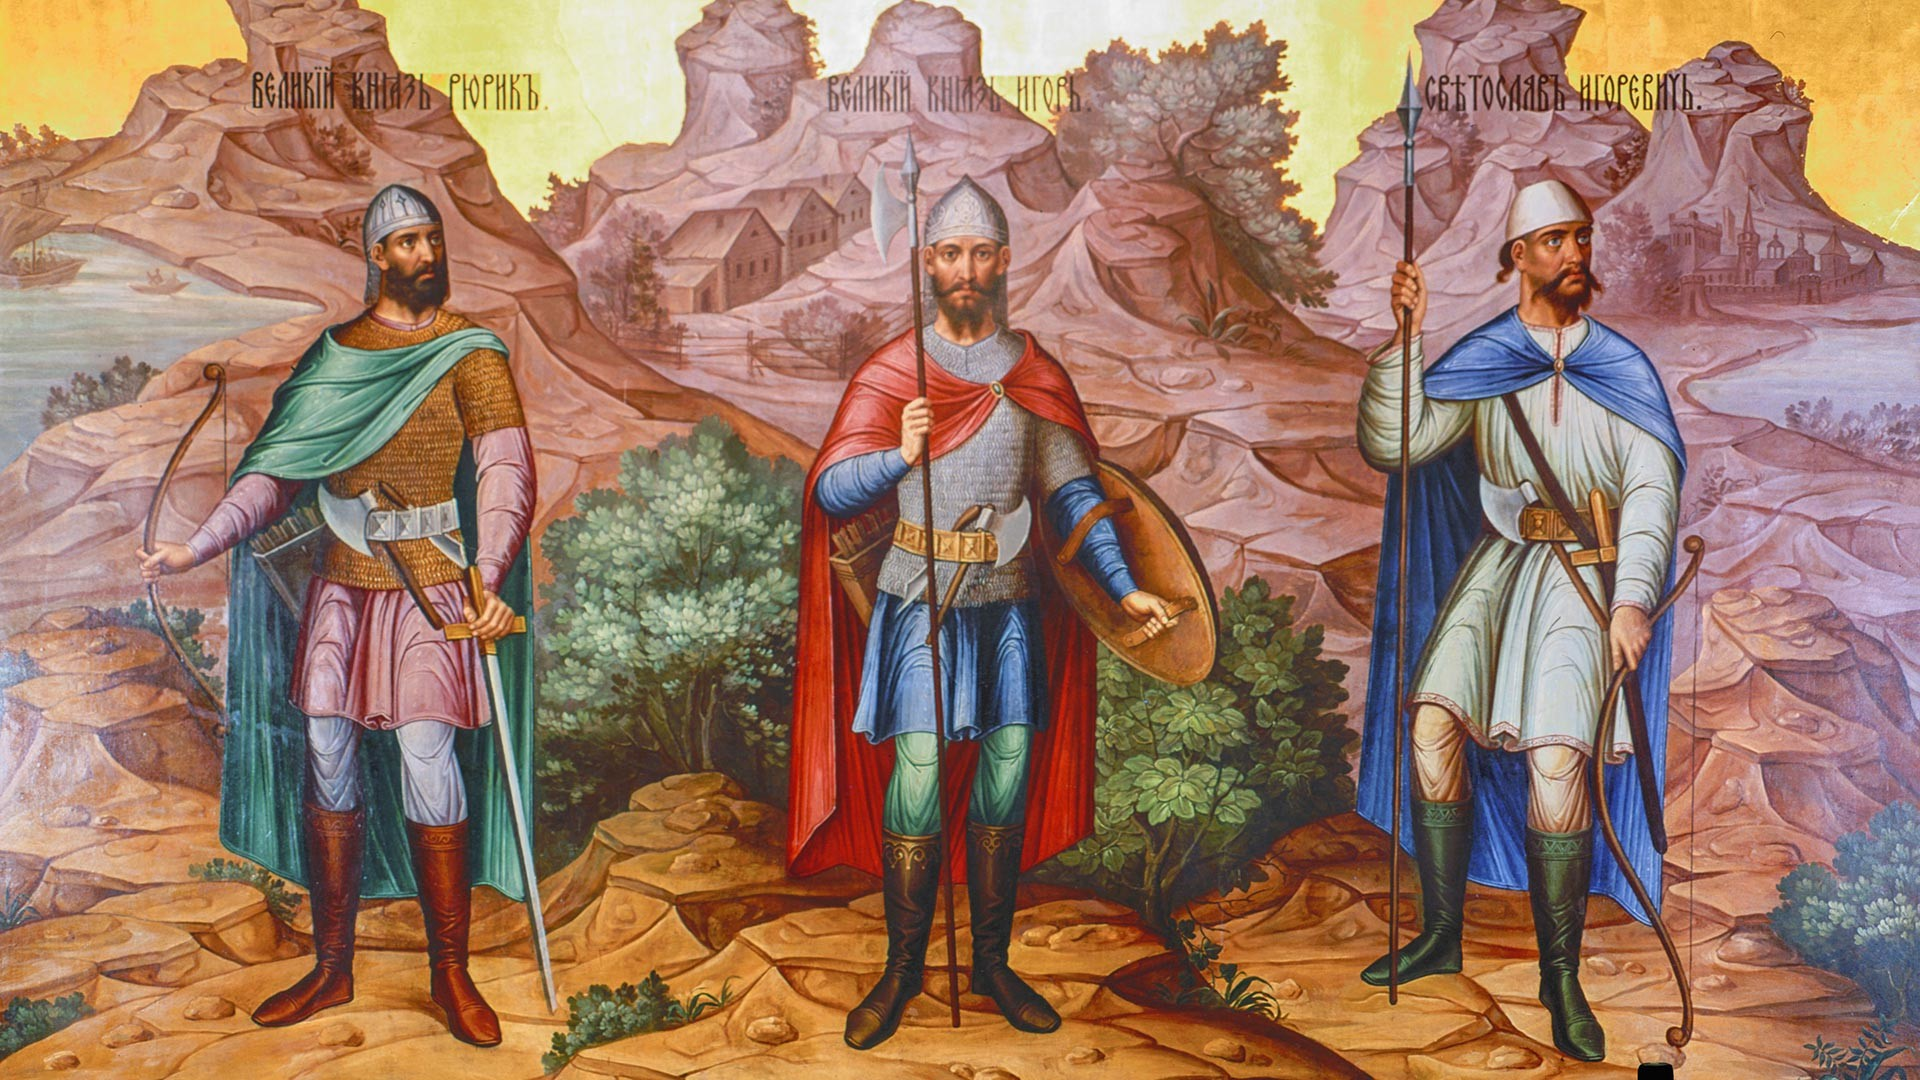 Dari kiri ke kanan: Adipati Agung Rurik, Adipati Agung Igor, Adipati Igor Svyatoslavovich. Sebuah fragmen mural. Granovitaya Palata, Kremlin Moskow.